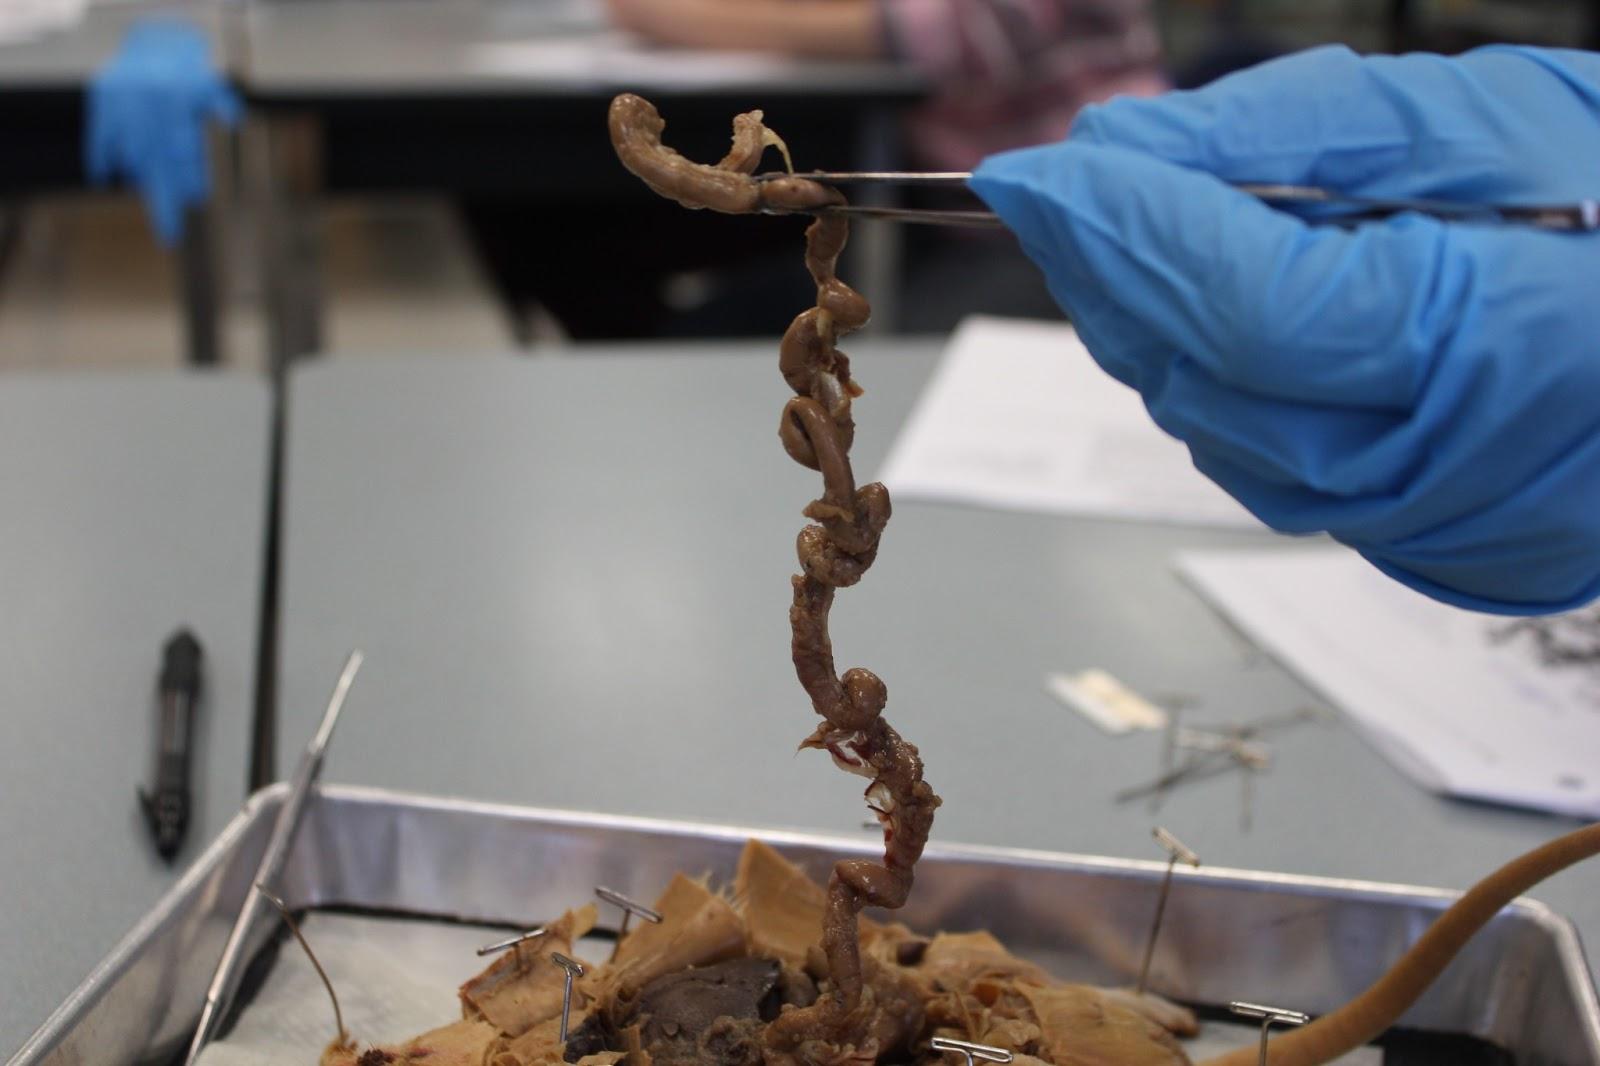 Biology and stuff (bio 11 class): Rat Dissection